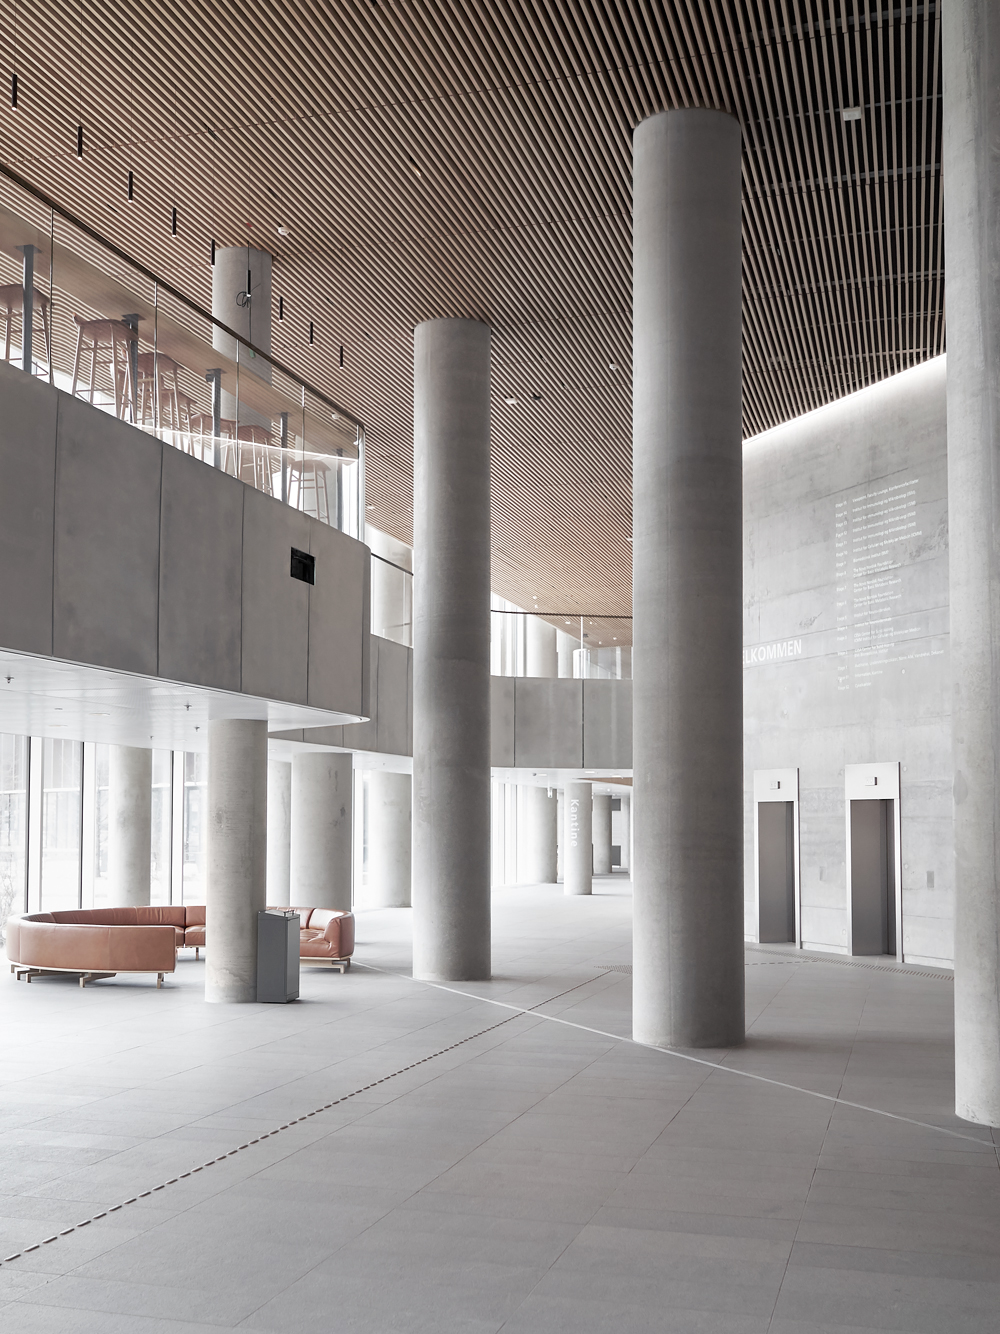 vegafoto-copenhagen-architecture.jpg